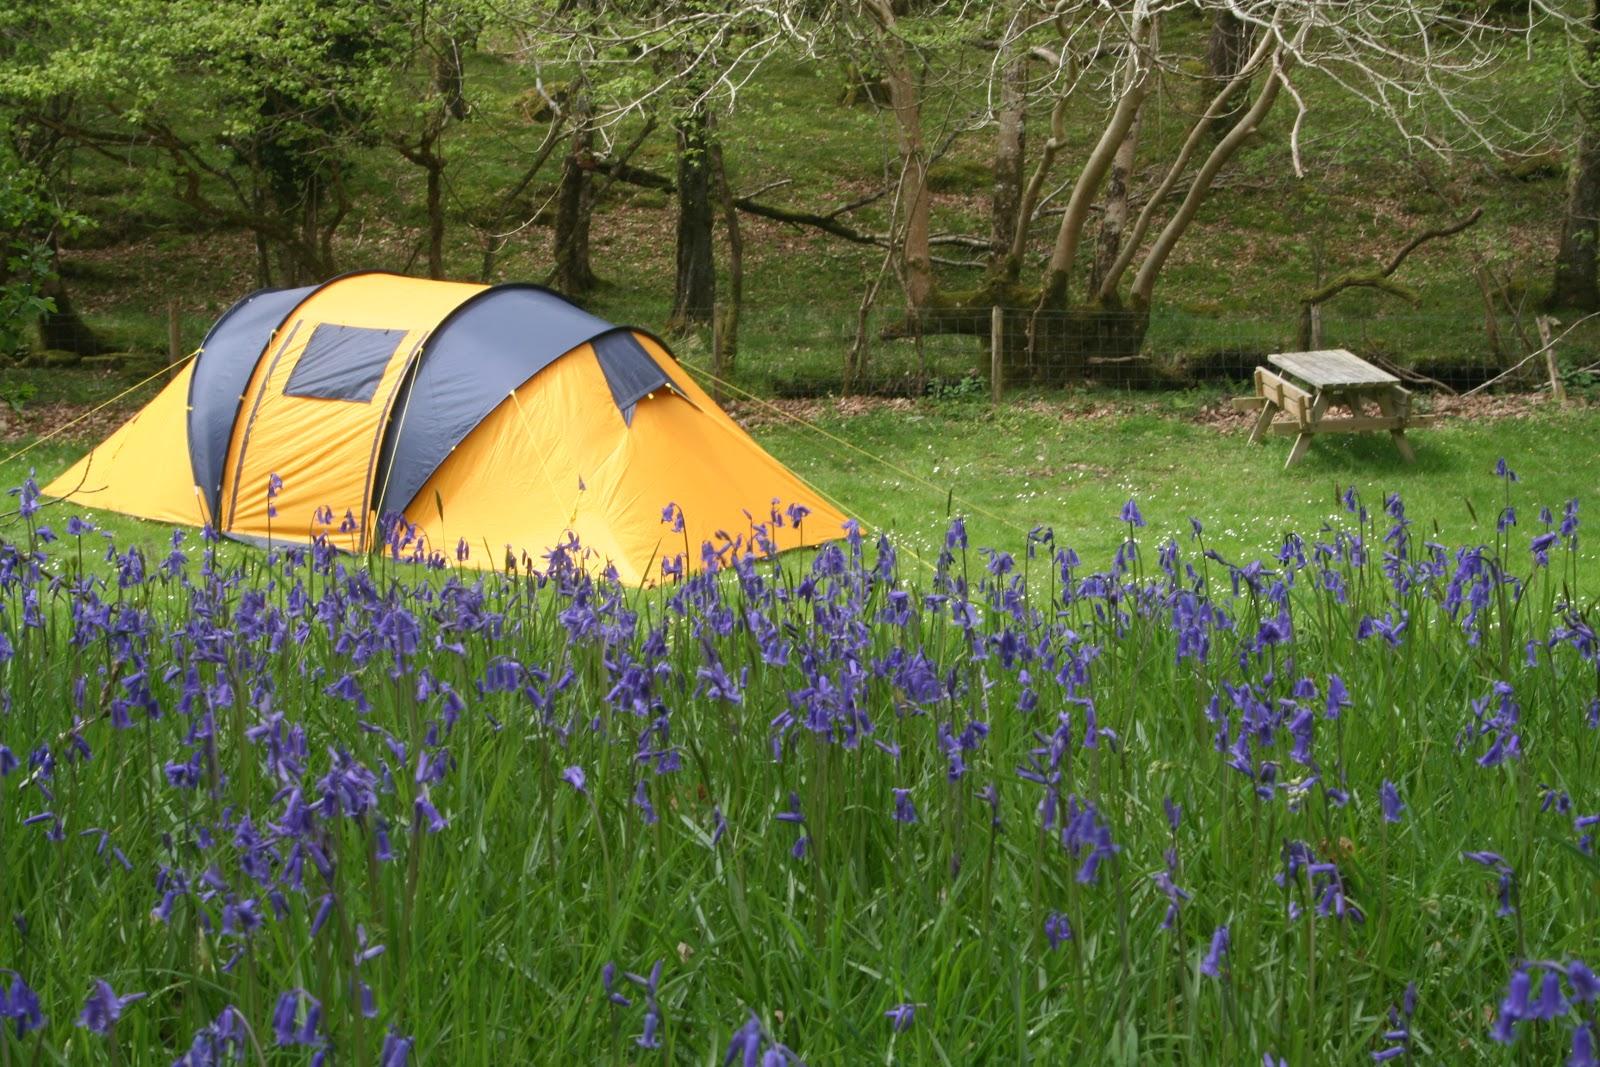 Dinas_camping_-_geograph.org.uk_-_1731943.jpg